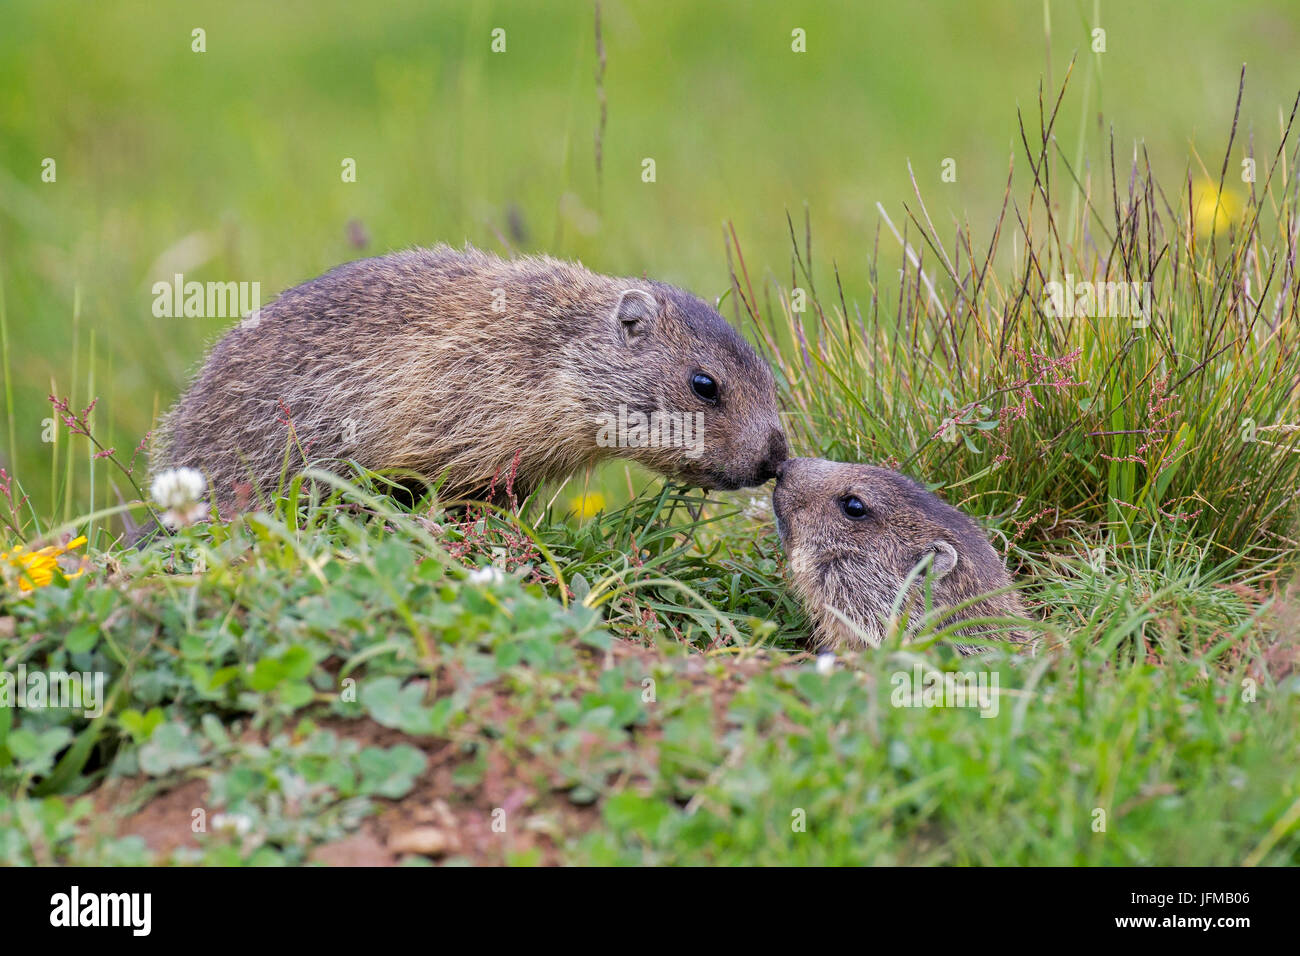 Stelvio National Park, Lombardy, Italy, Marmots - Stock Image